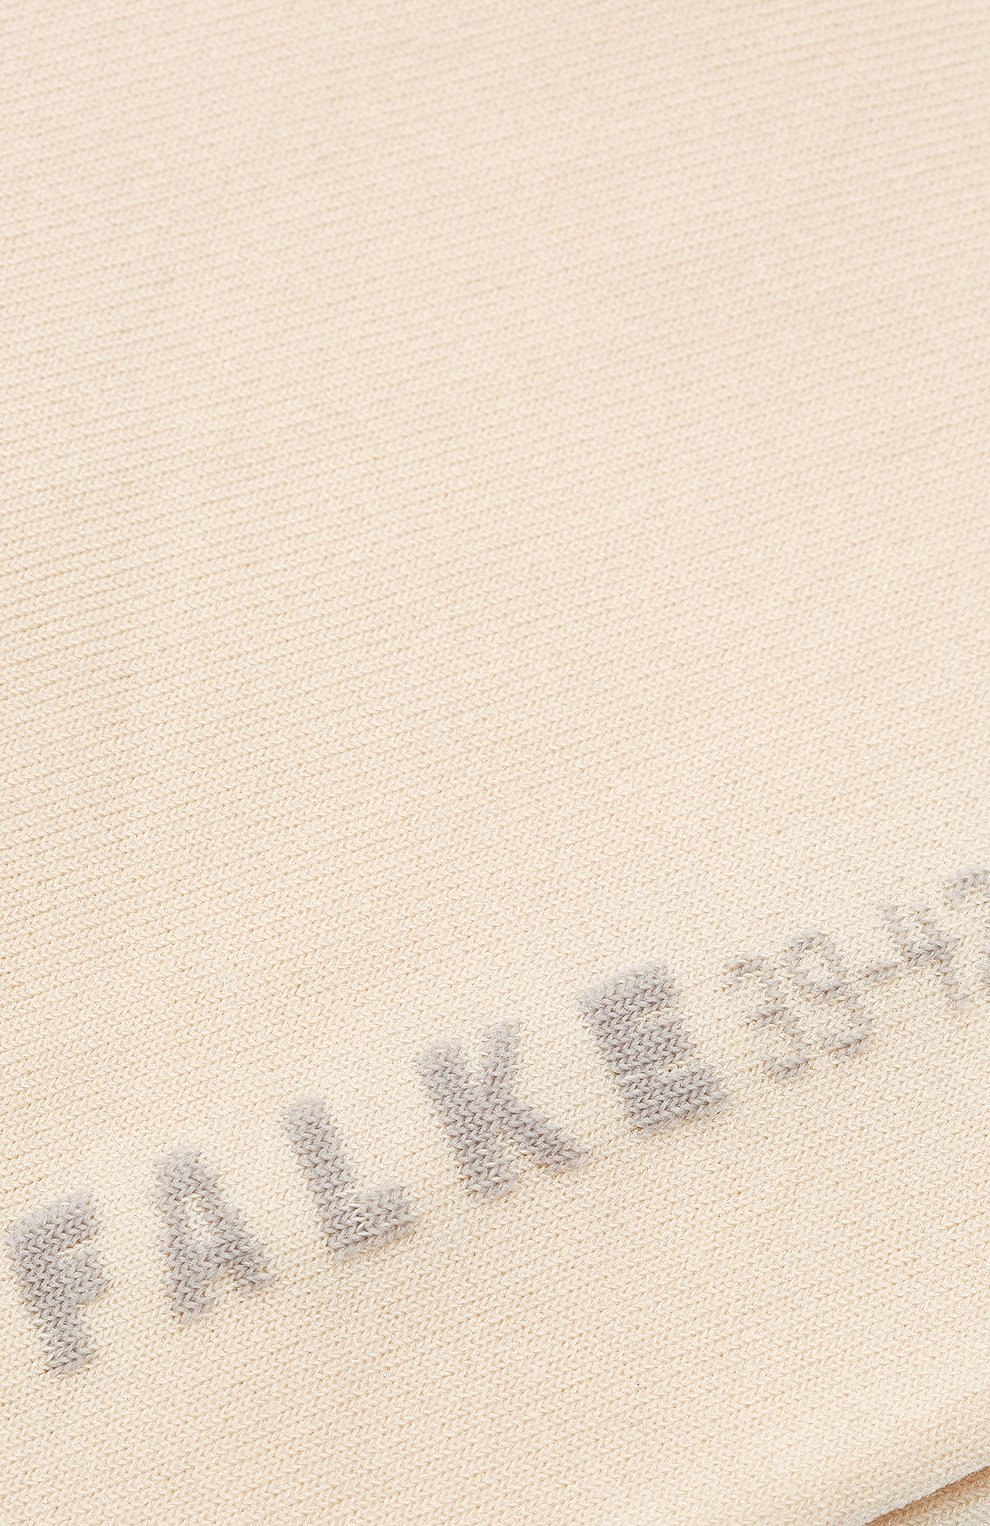 Женские хлопковые носки cotton touch FALKE бежевого цвета, арт. 47539_ | Фото 2